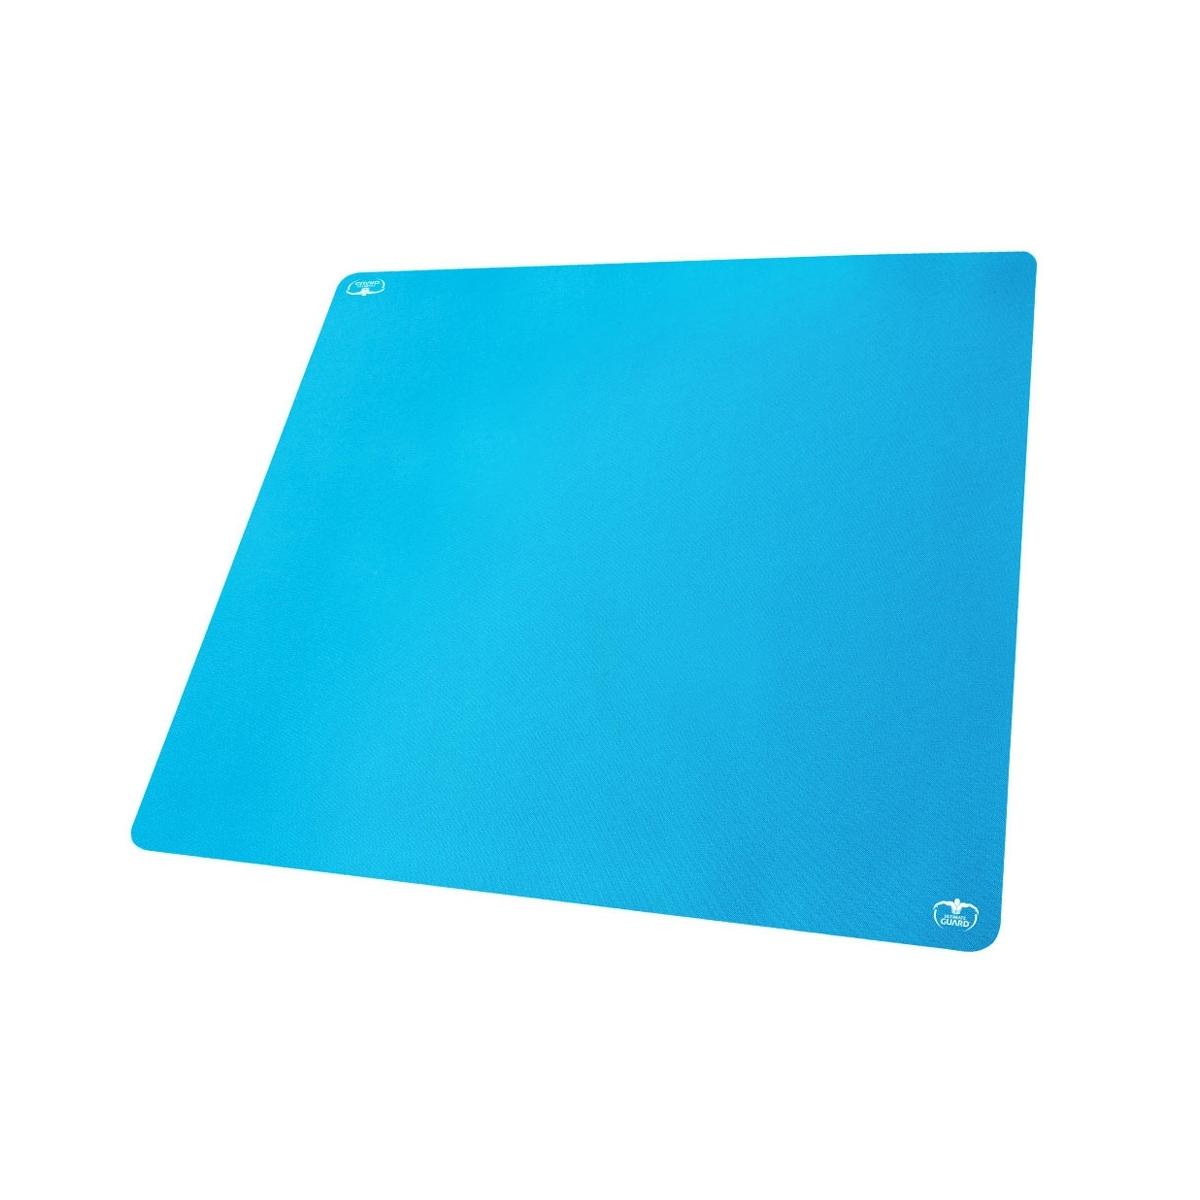 ultimate guard tapis de jeu 60 monochrome bleu clair 61. Black Bedroom Furniture Sets. Home Design Ideas